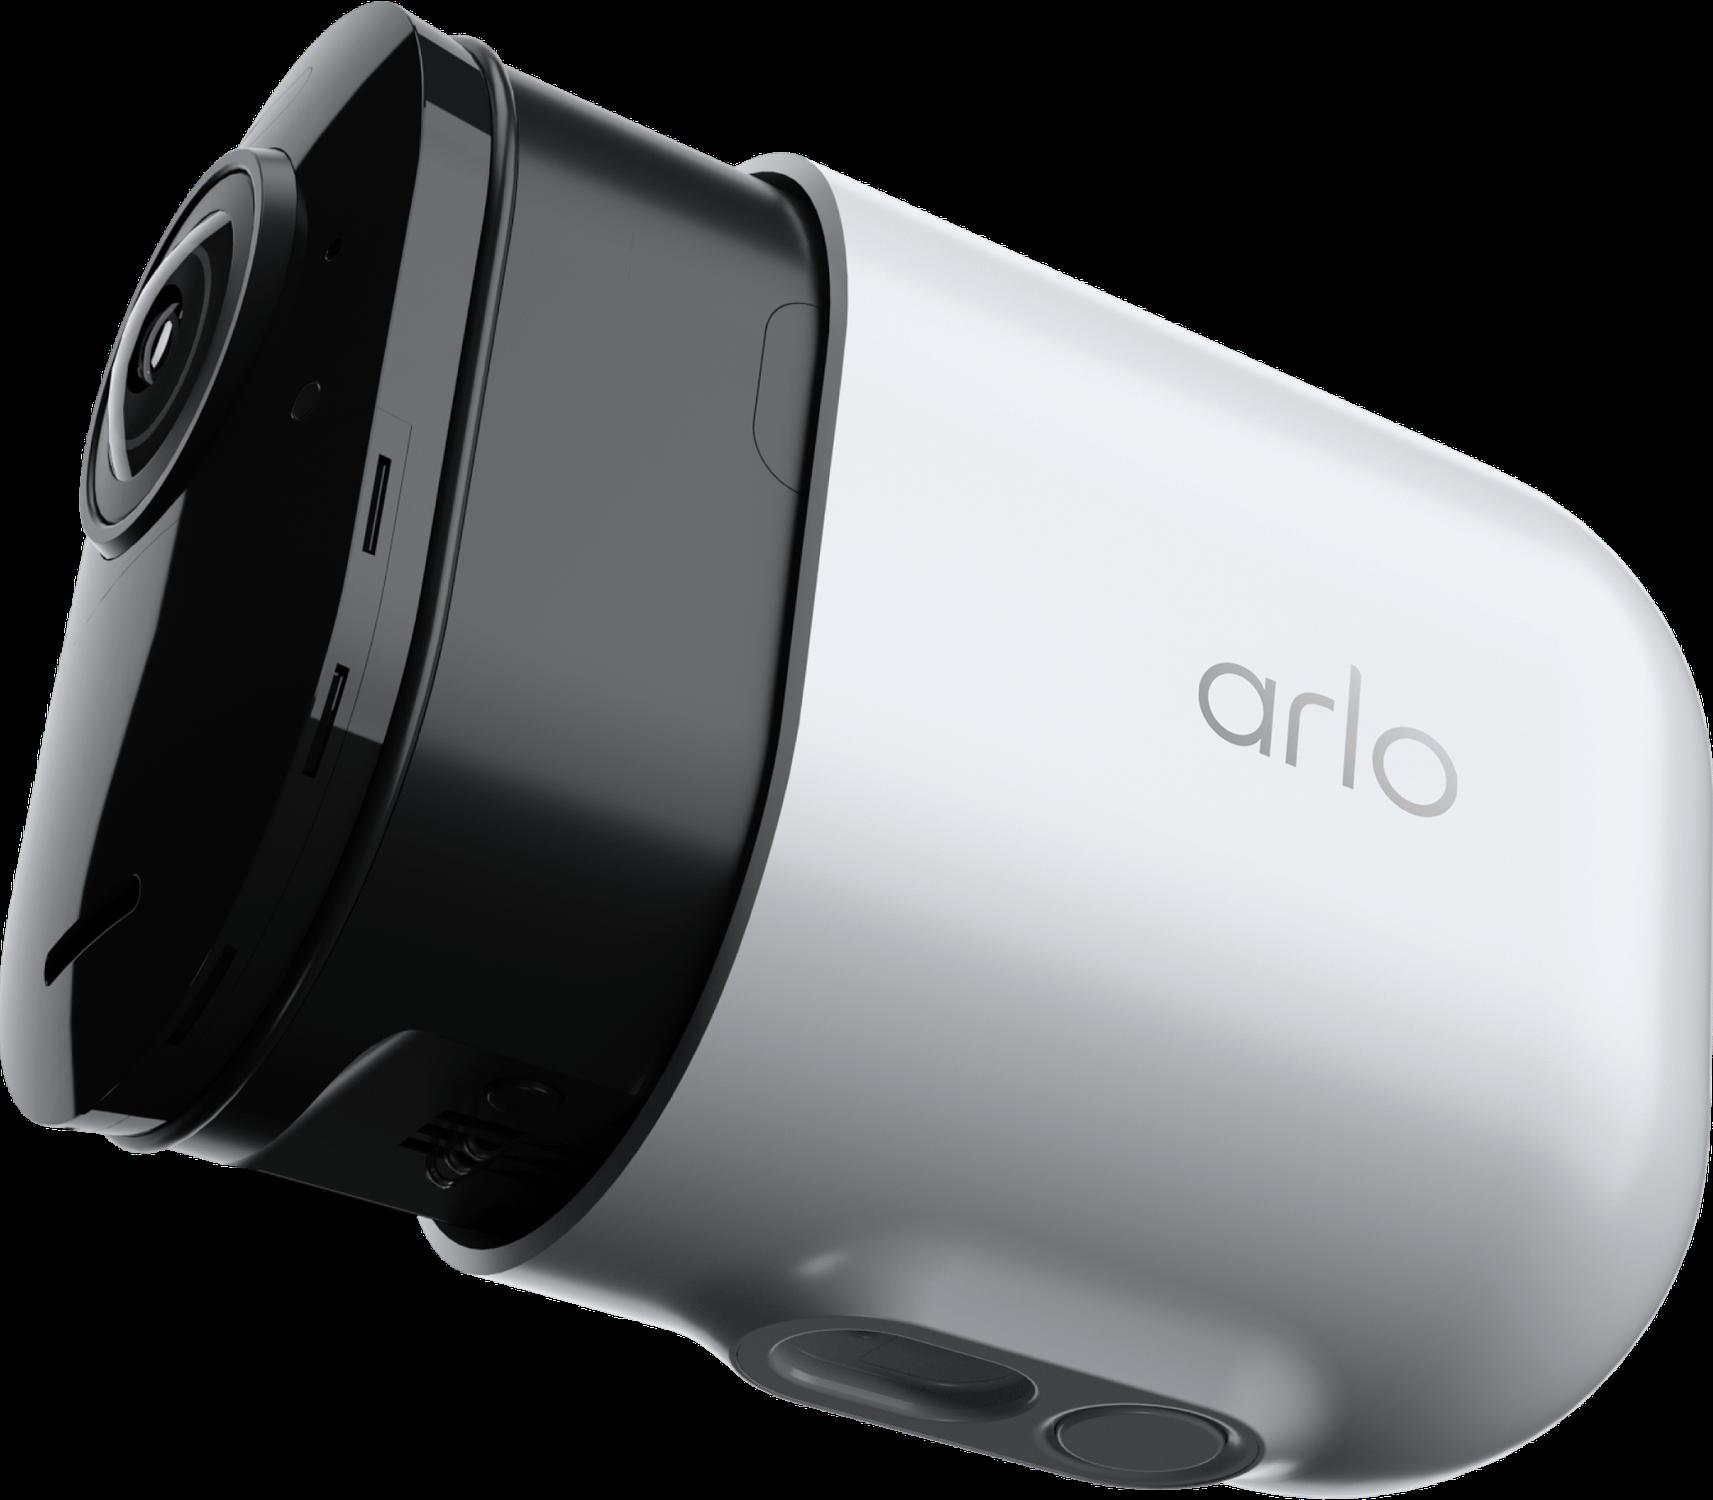 Hyper-realistic 3D render of Arlo security camera.